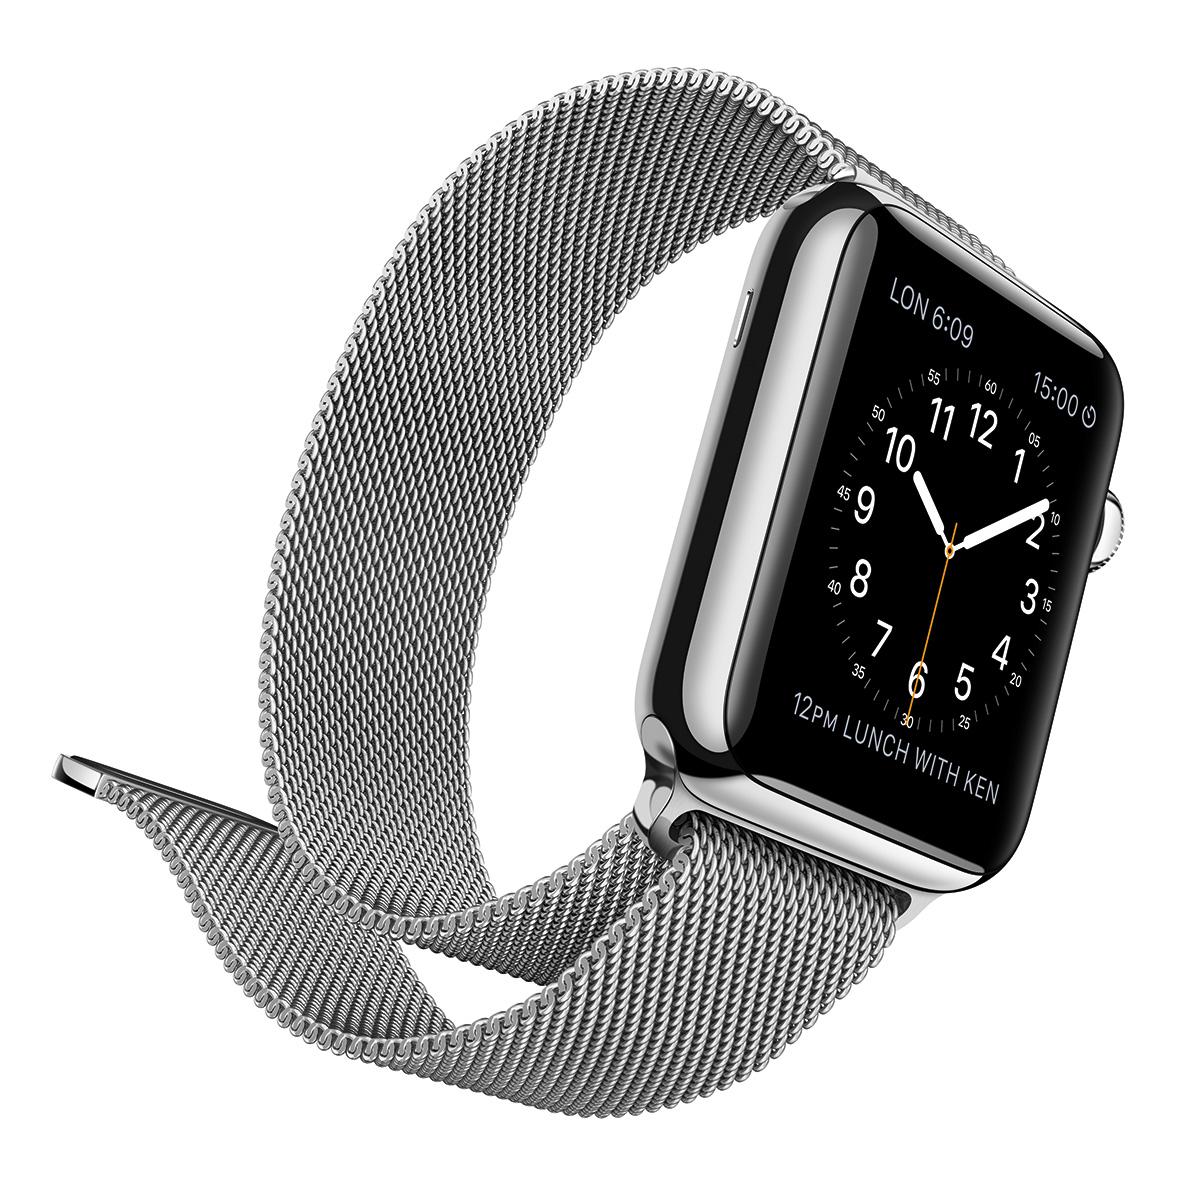 Will Apple Watch will be immediate success?